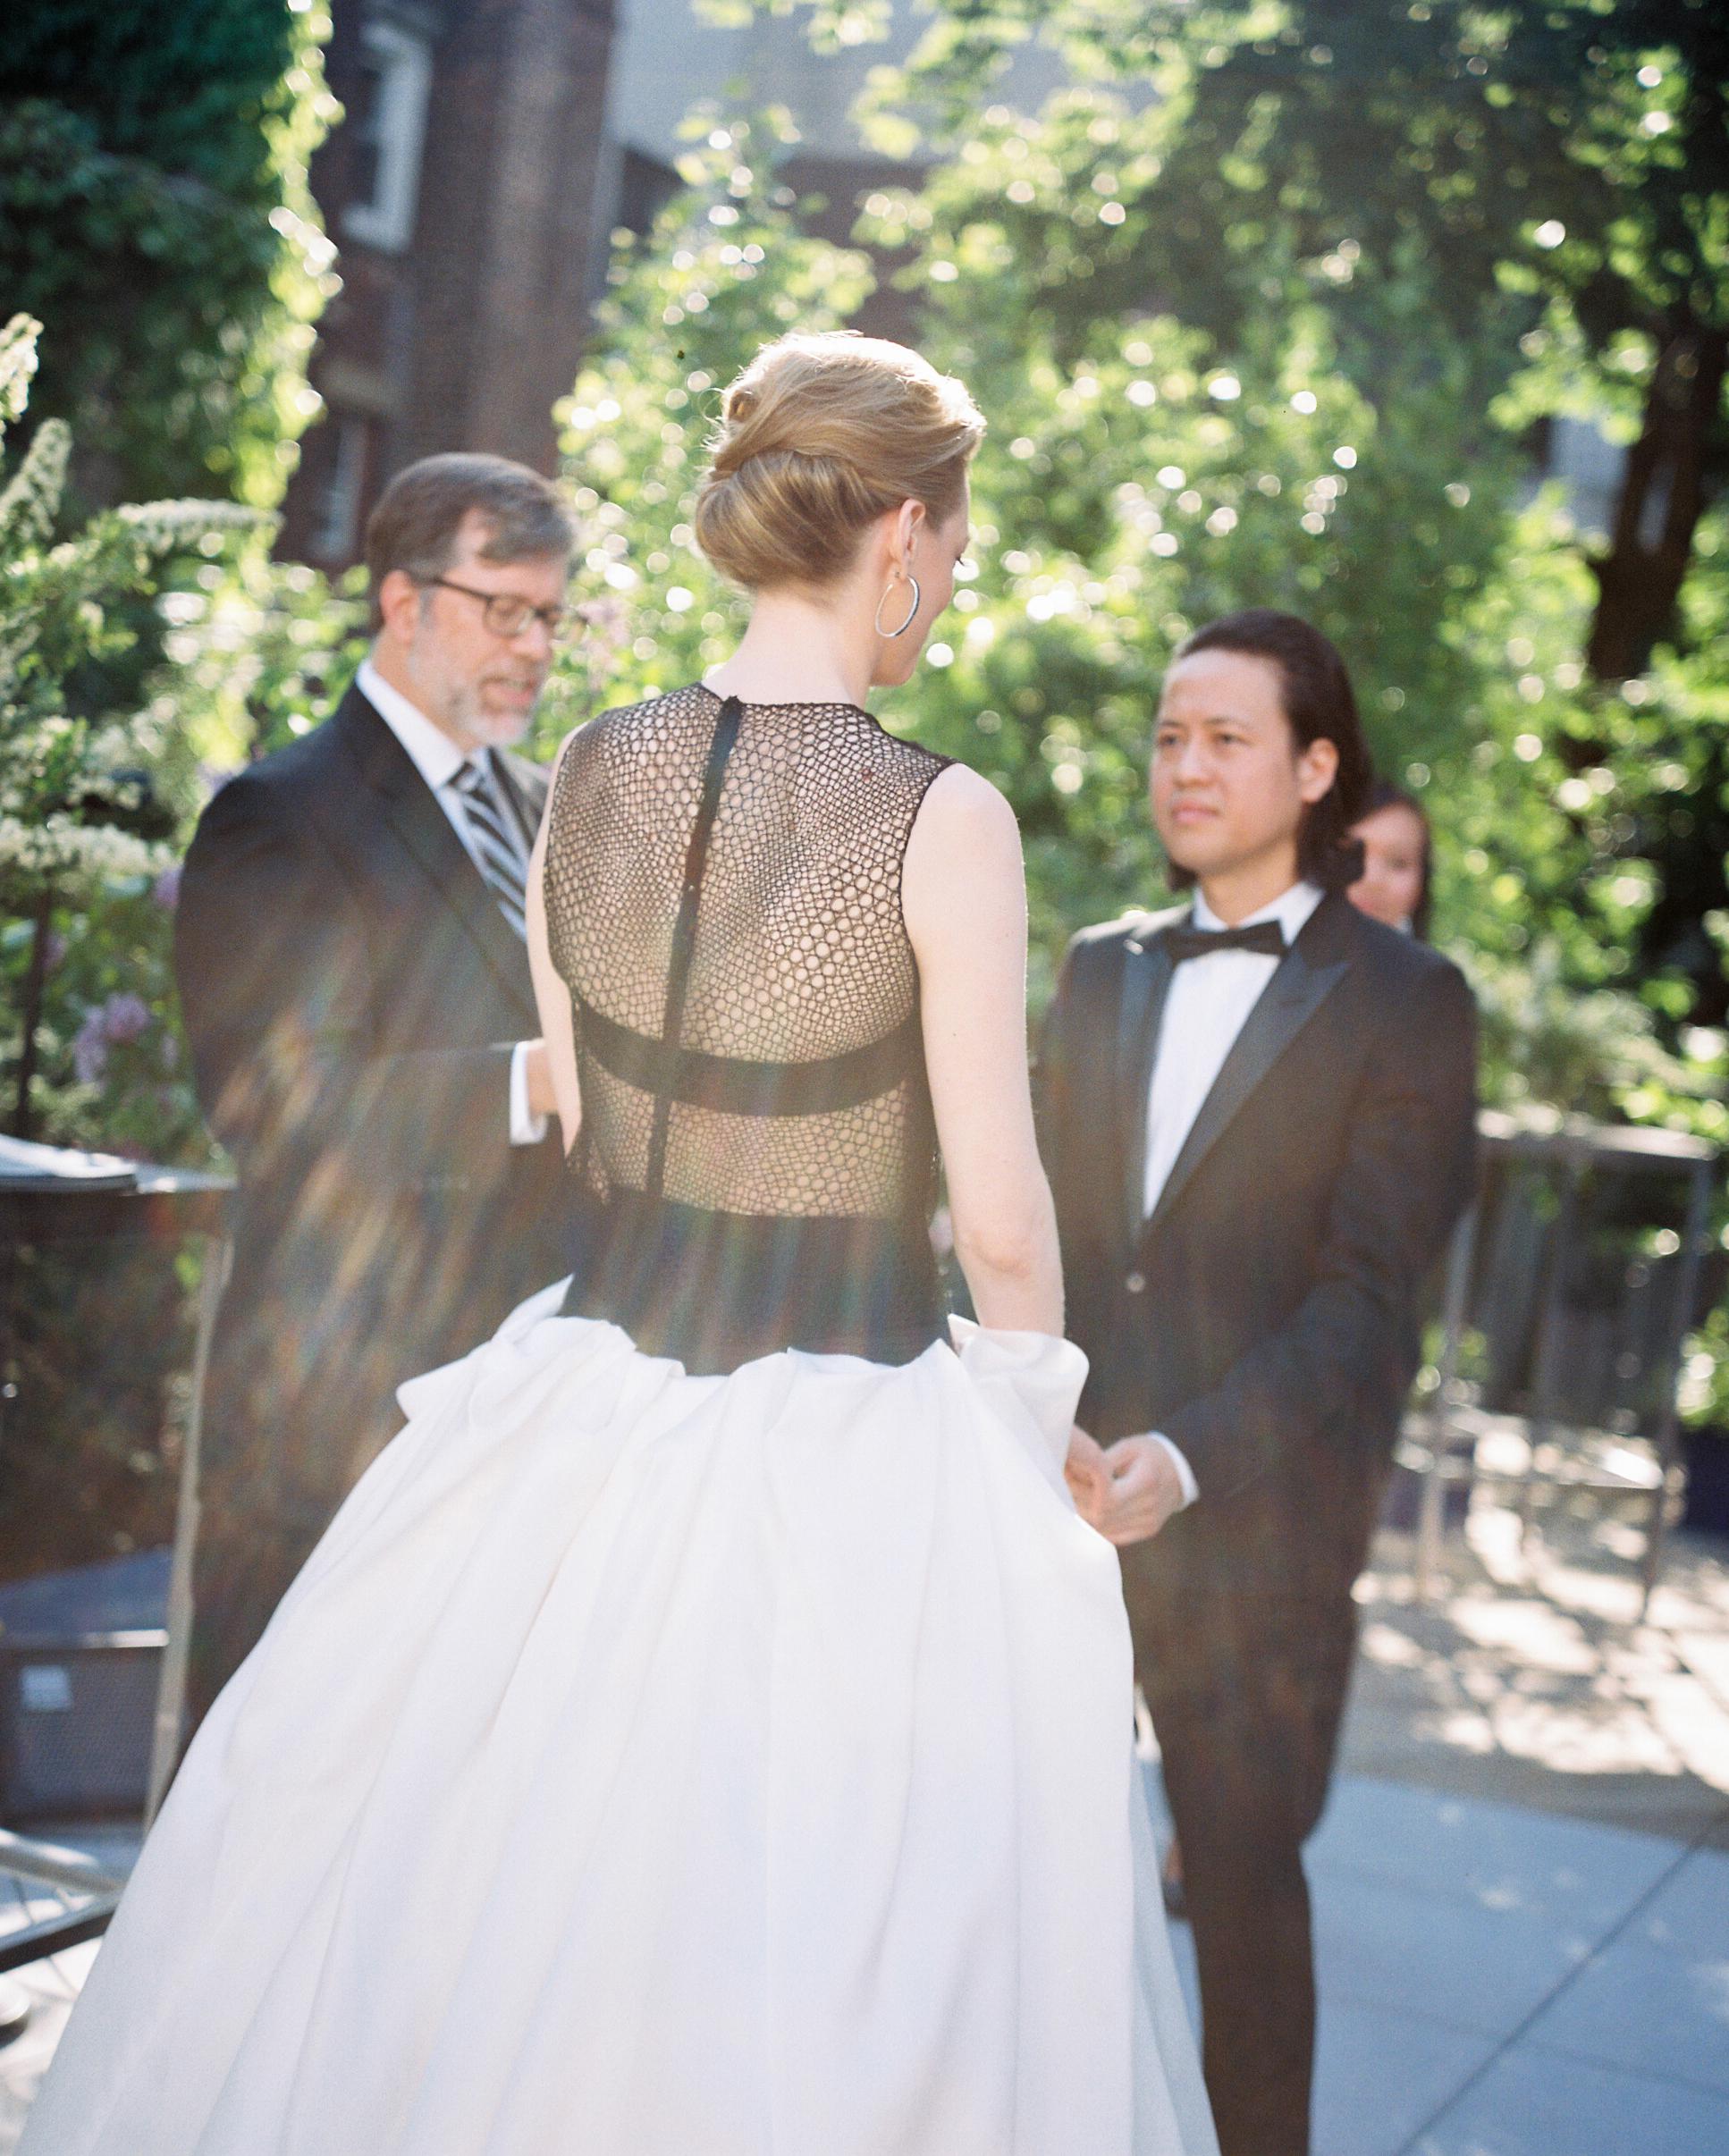 amy-sheldon-wedding-ceremony-0224-s112088-0815.jpg